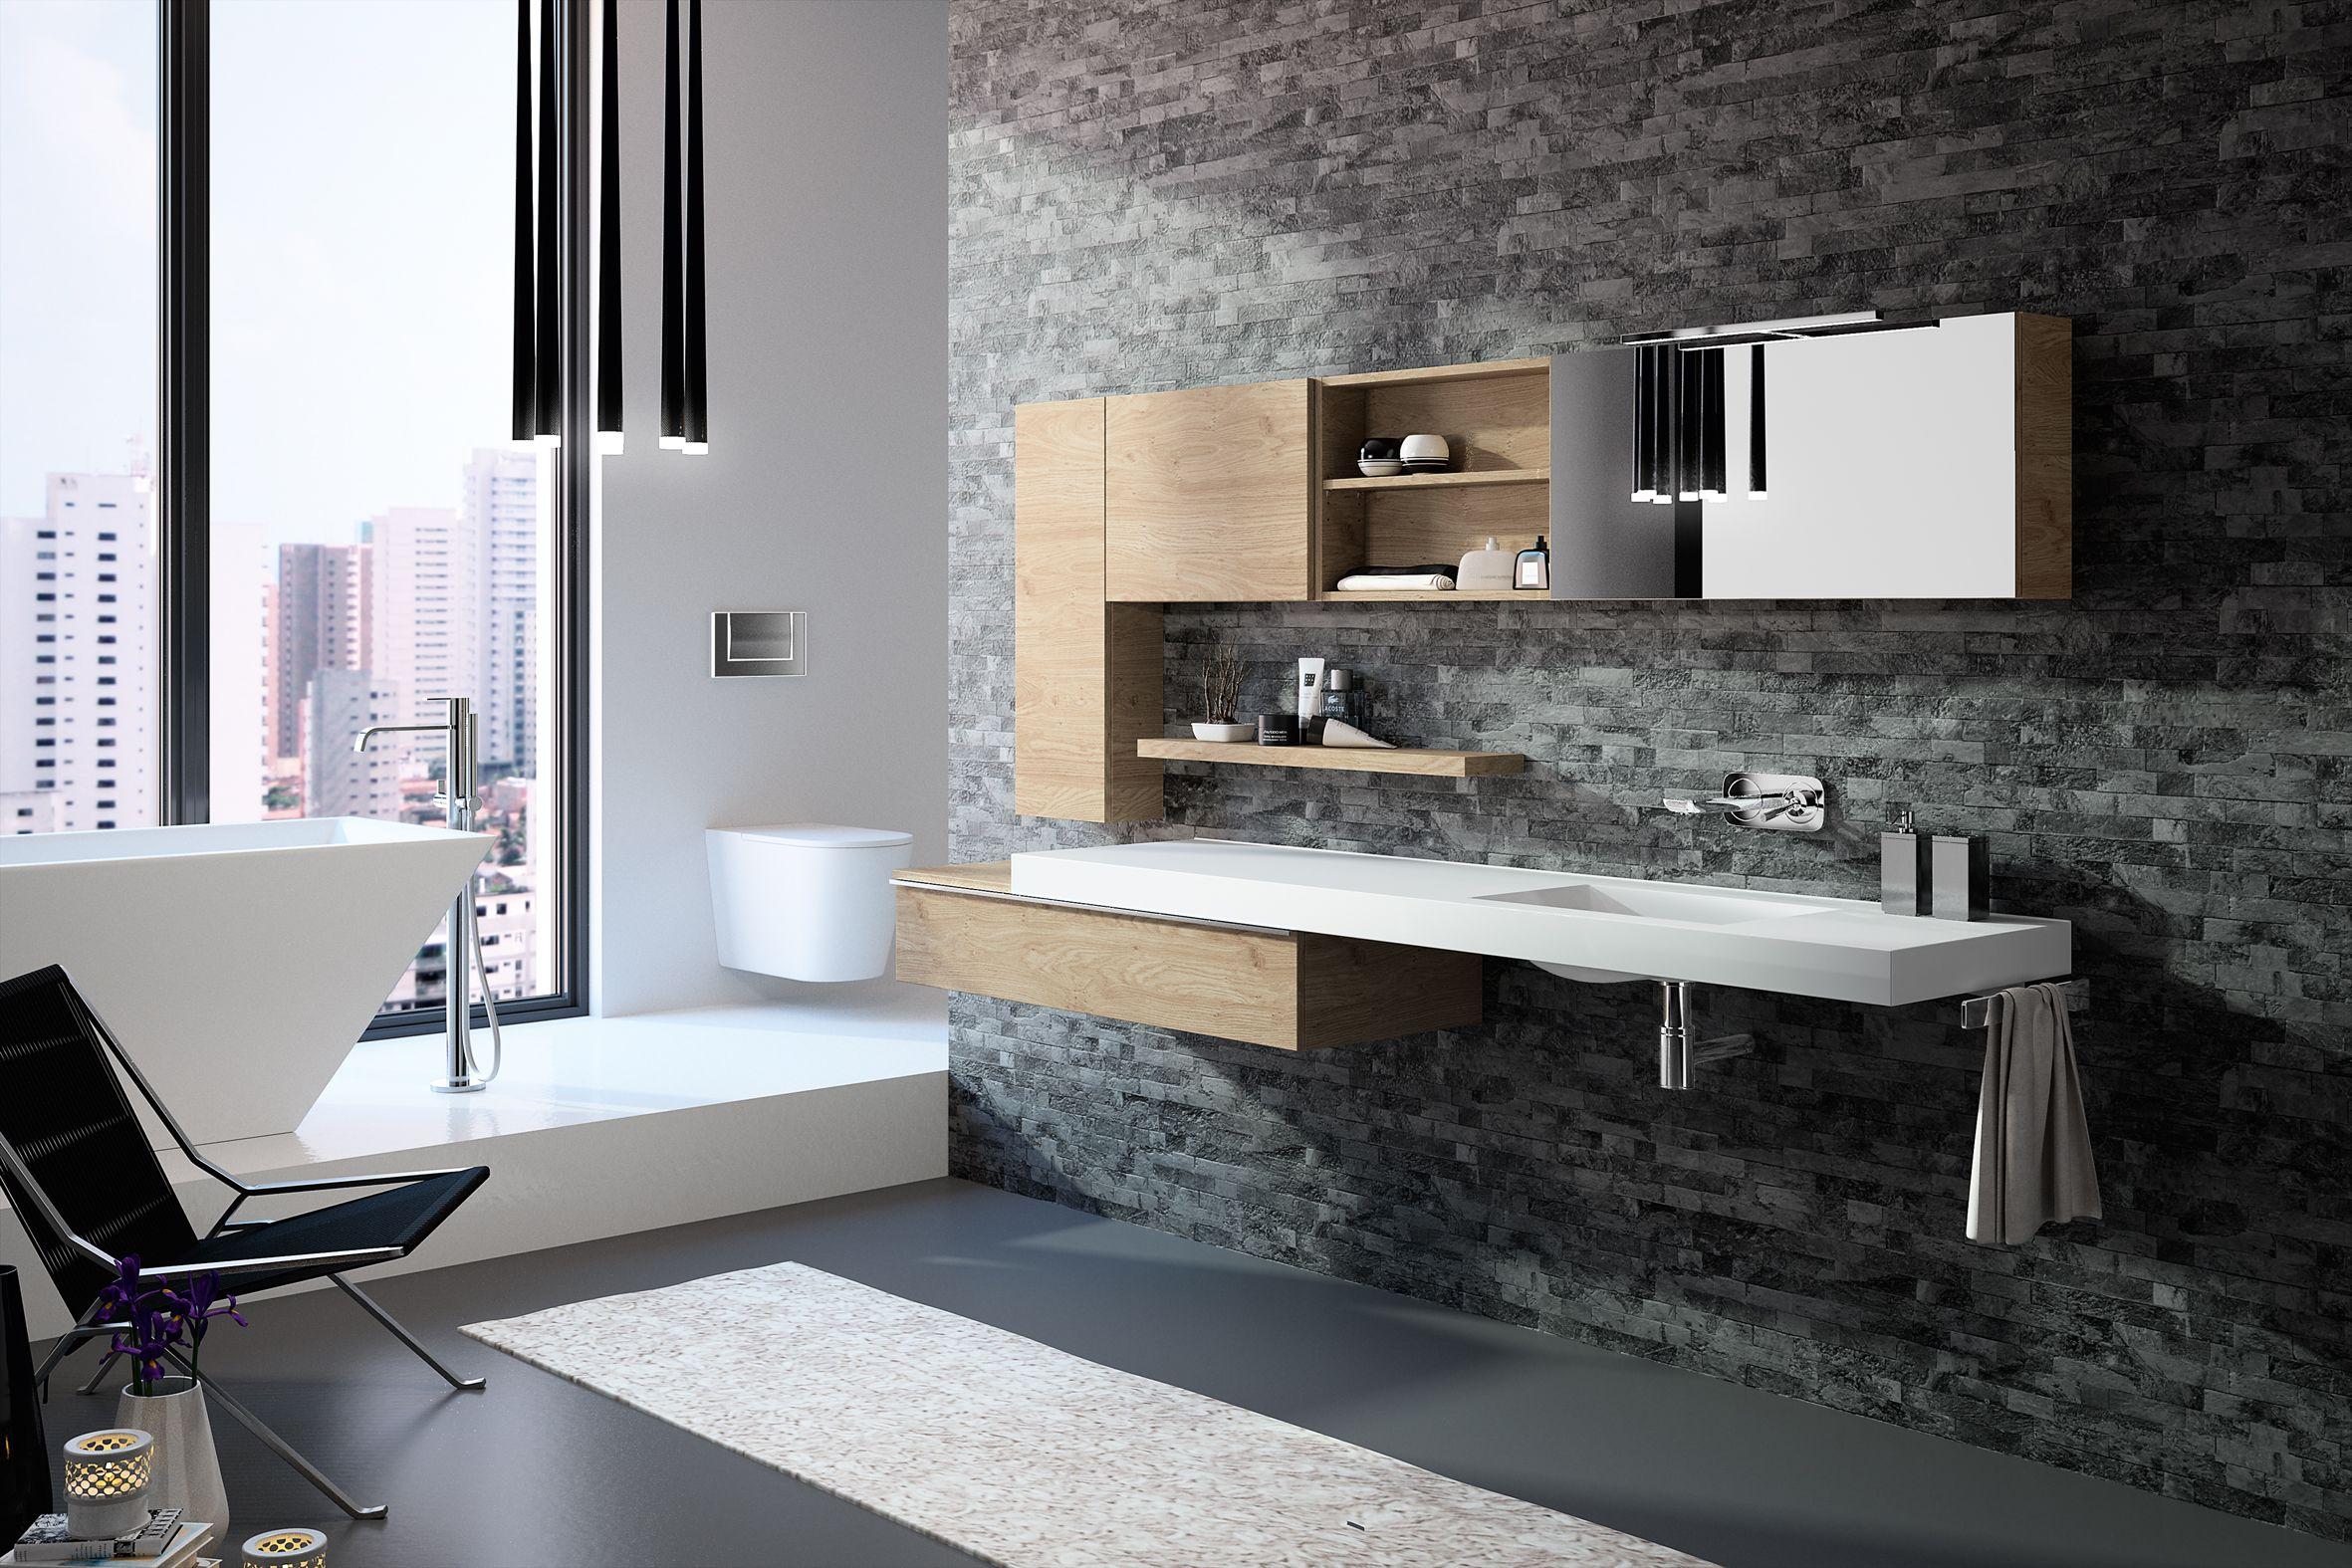 meubles de salle de bain cedam gamme extenso sur mesure. Black Bedroom Furniture Sets. Home Design Ideas